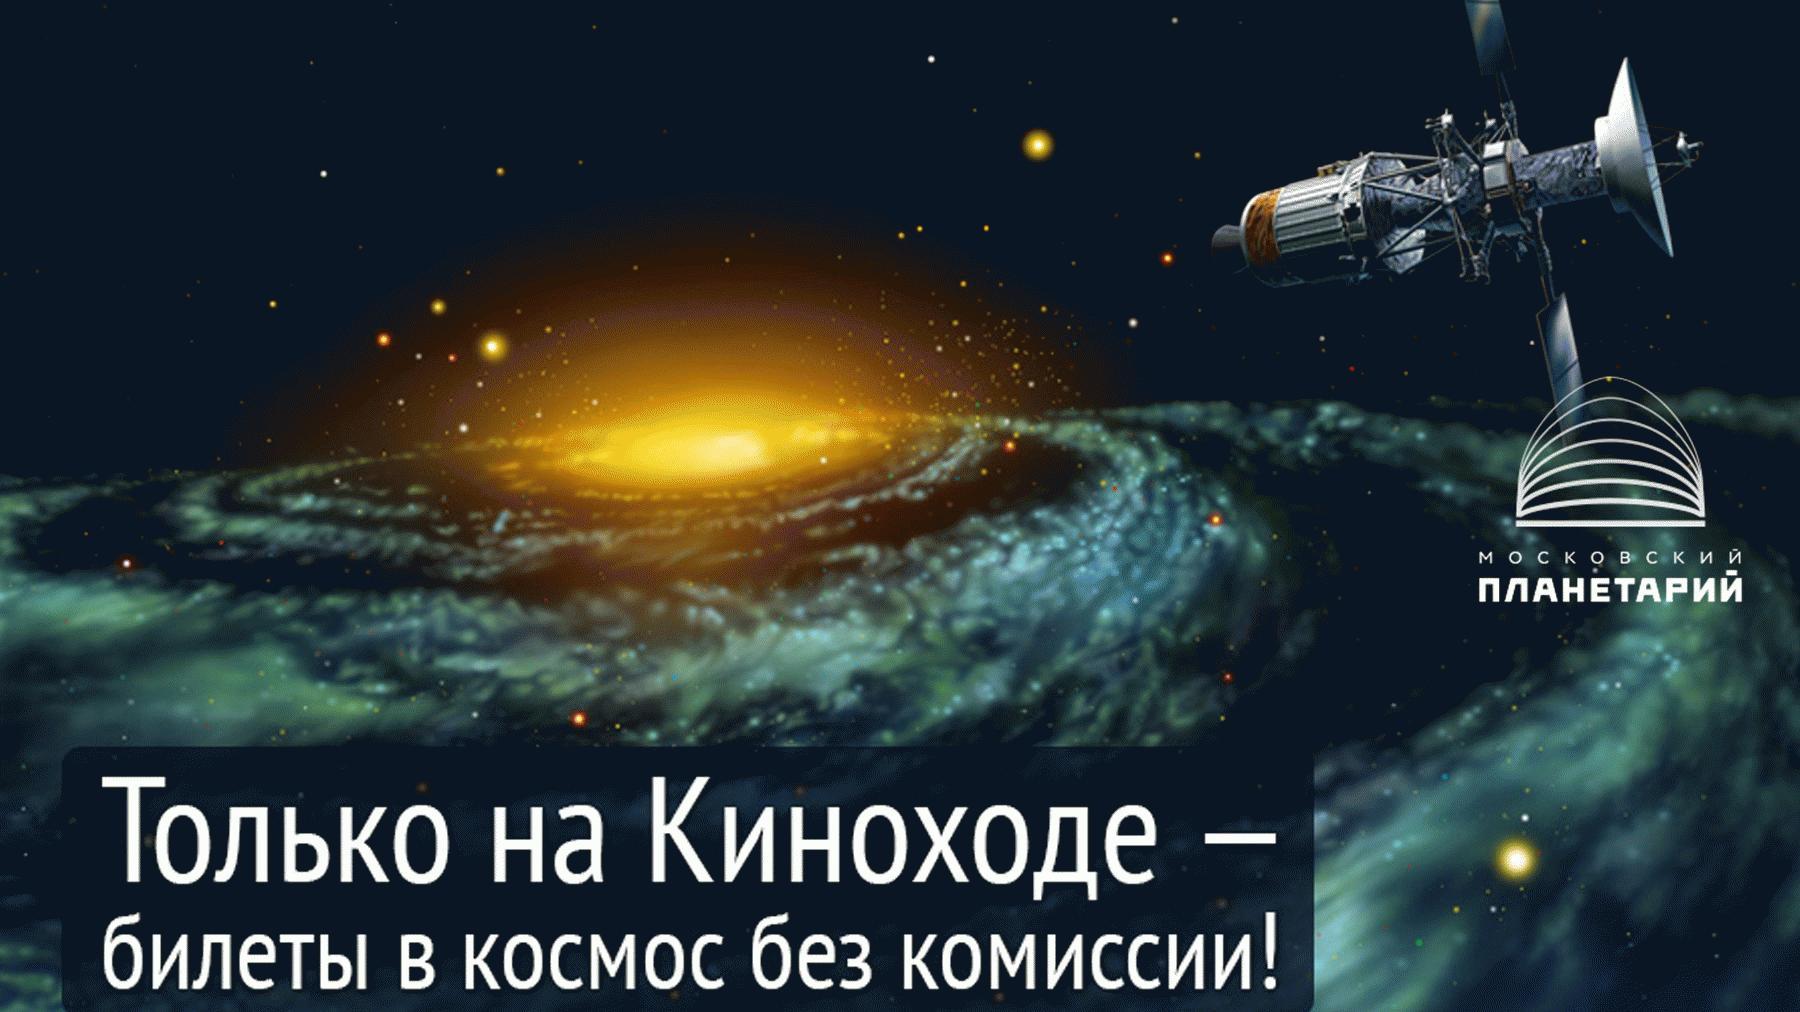 Планетарий. Космос: на пути к познанию